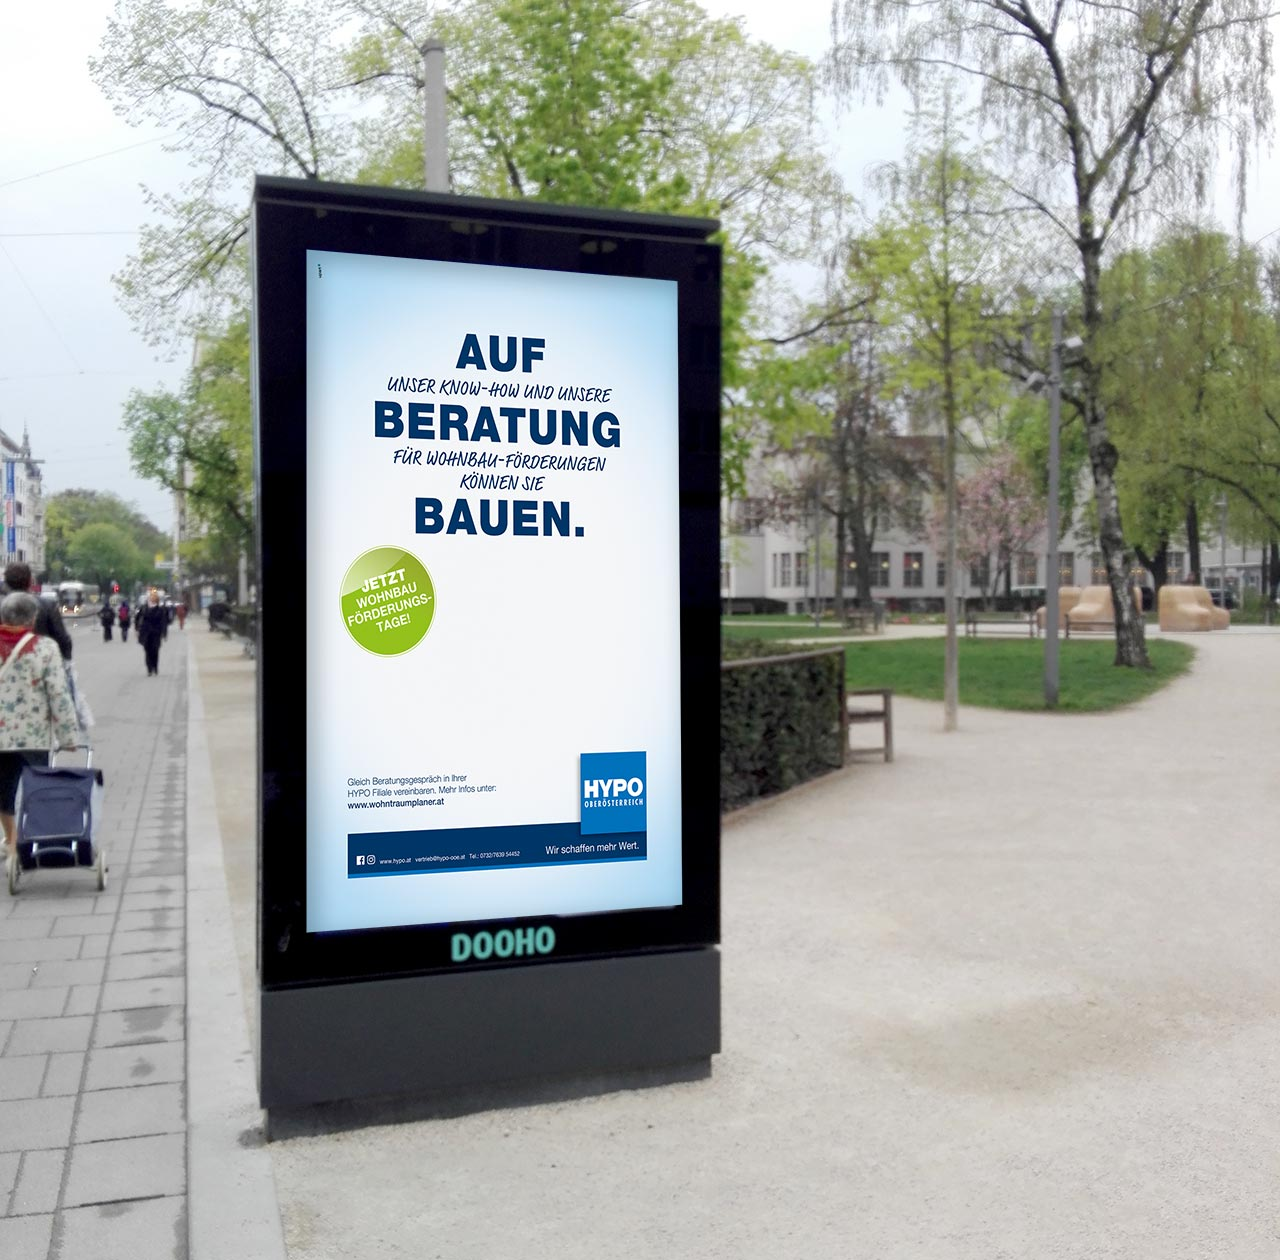 upart-referenz-hypo kampagne